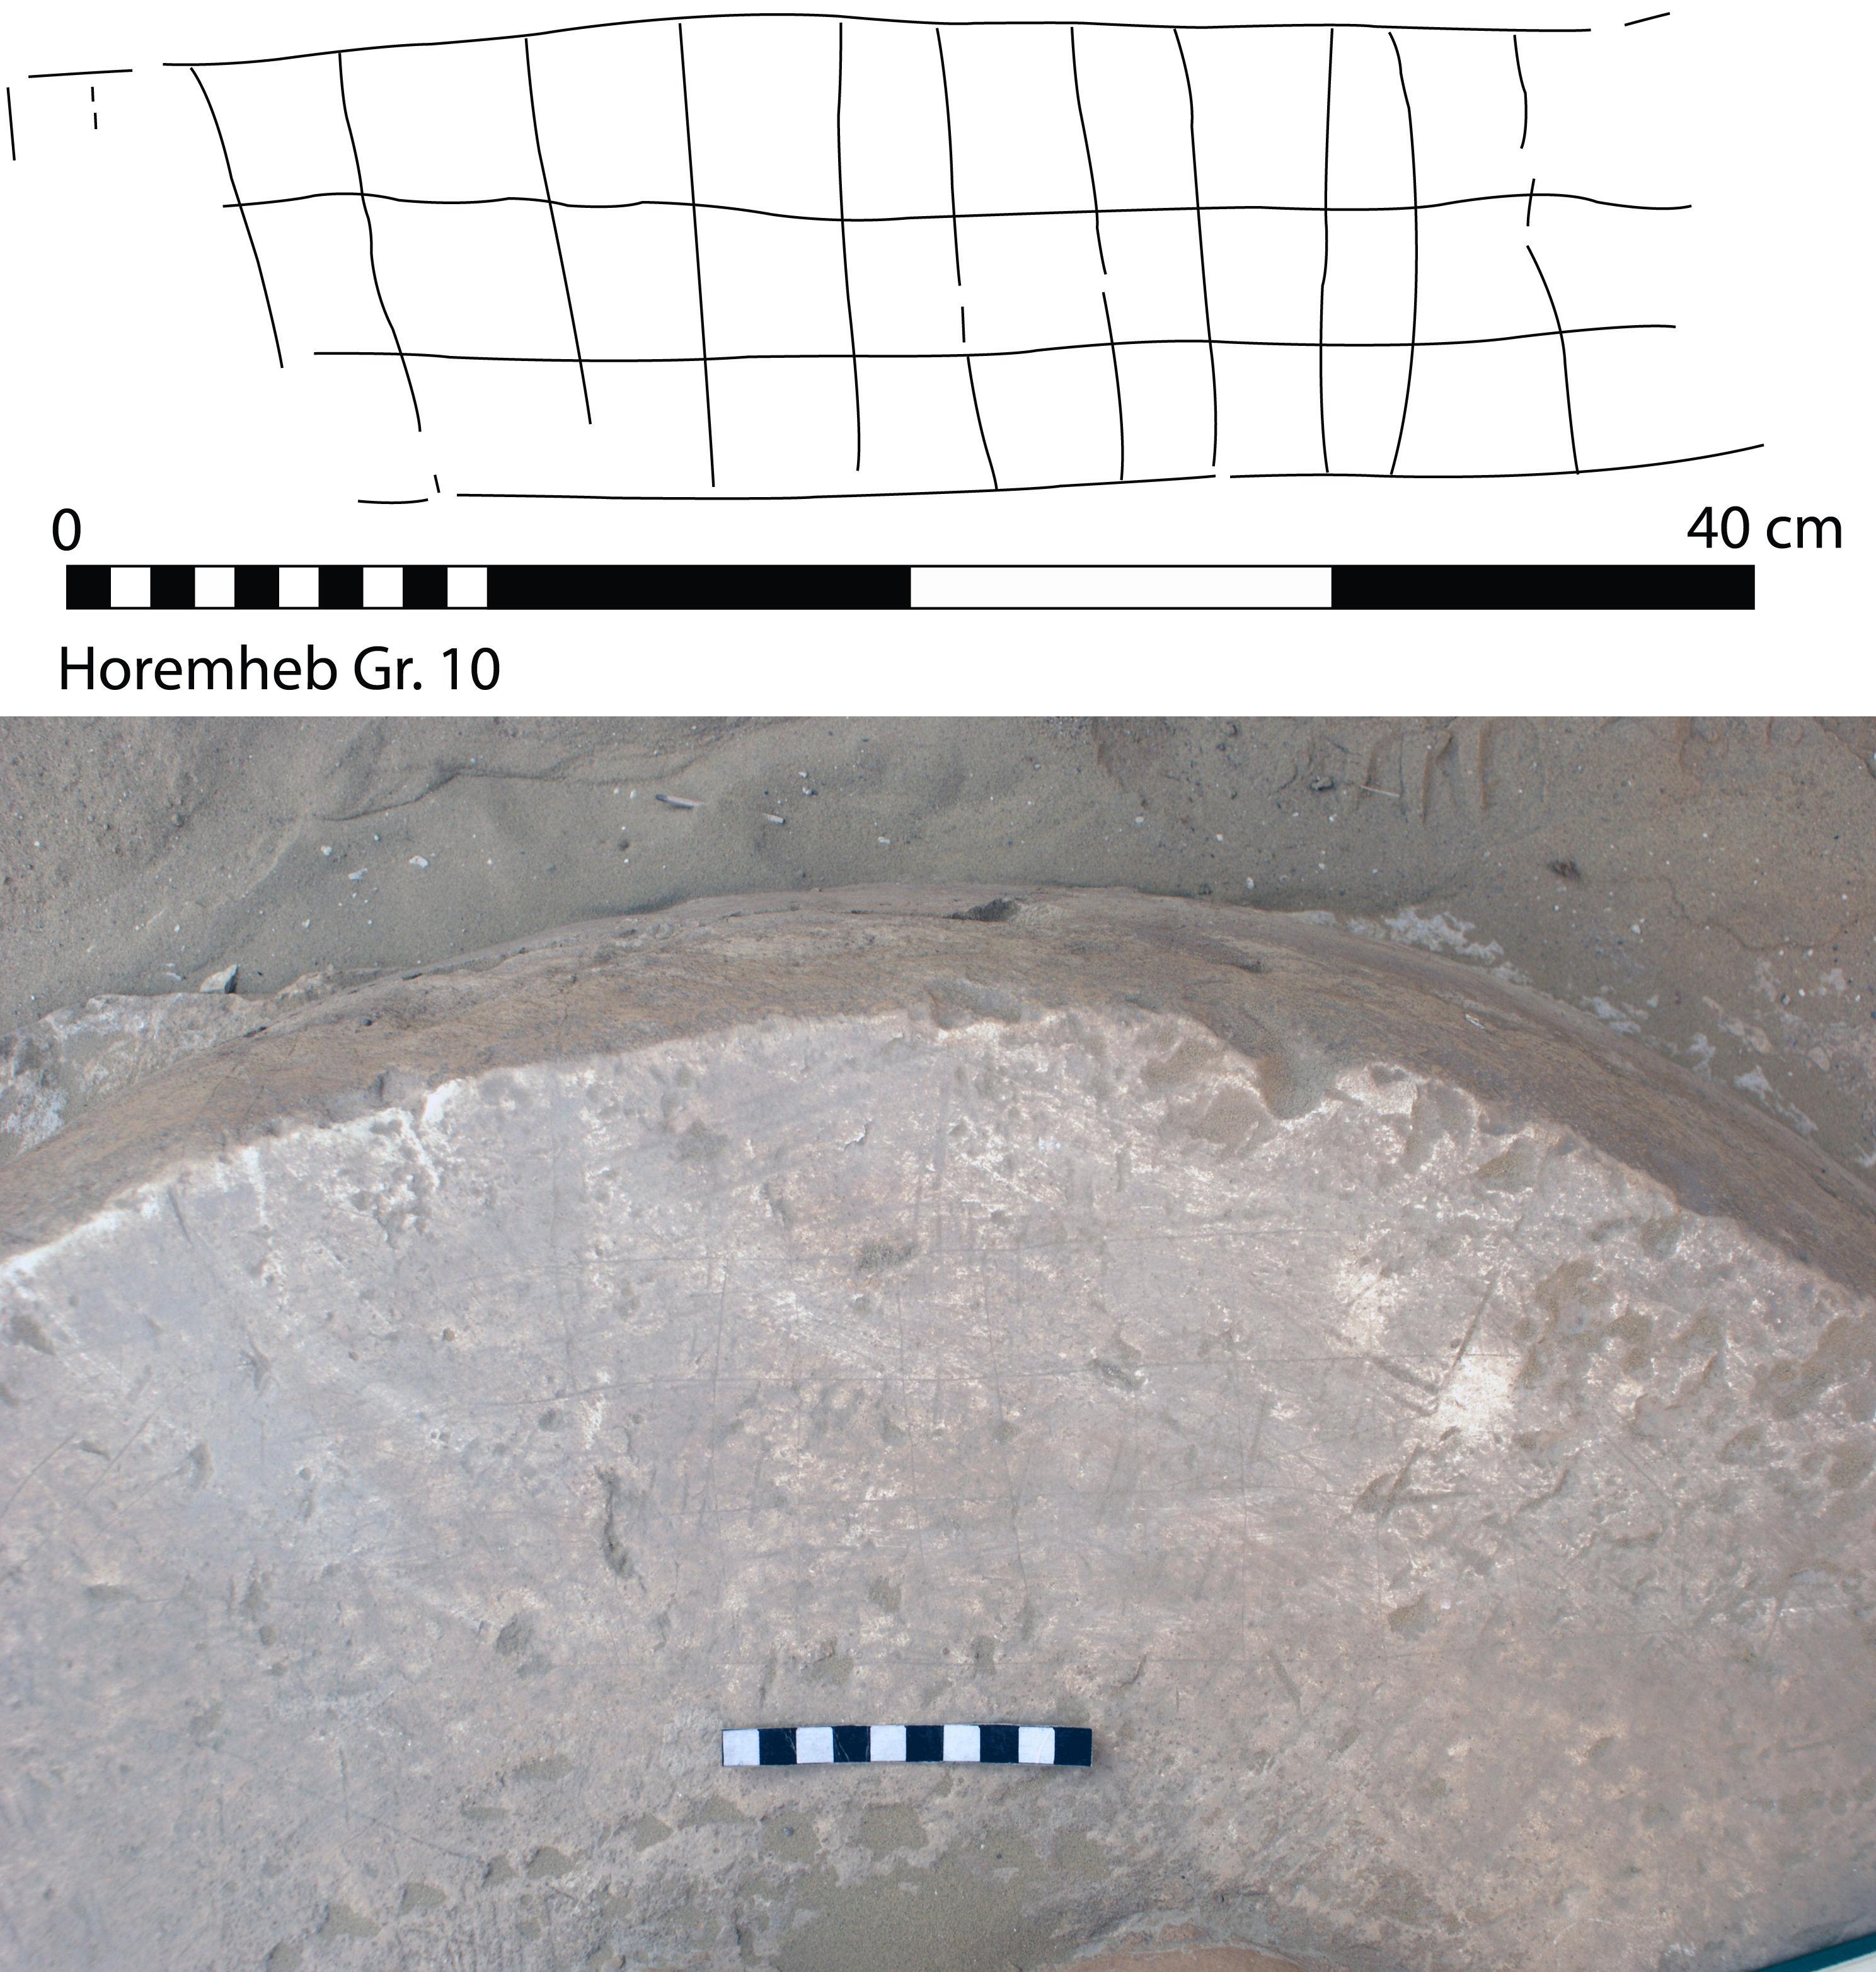 fig-31-large